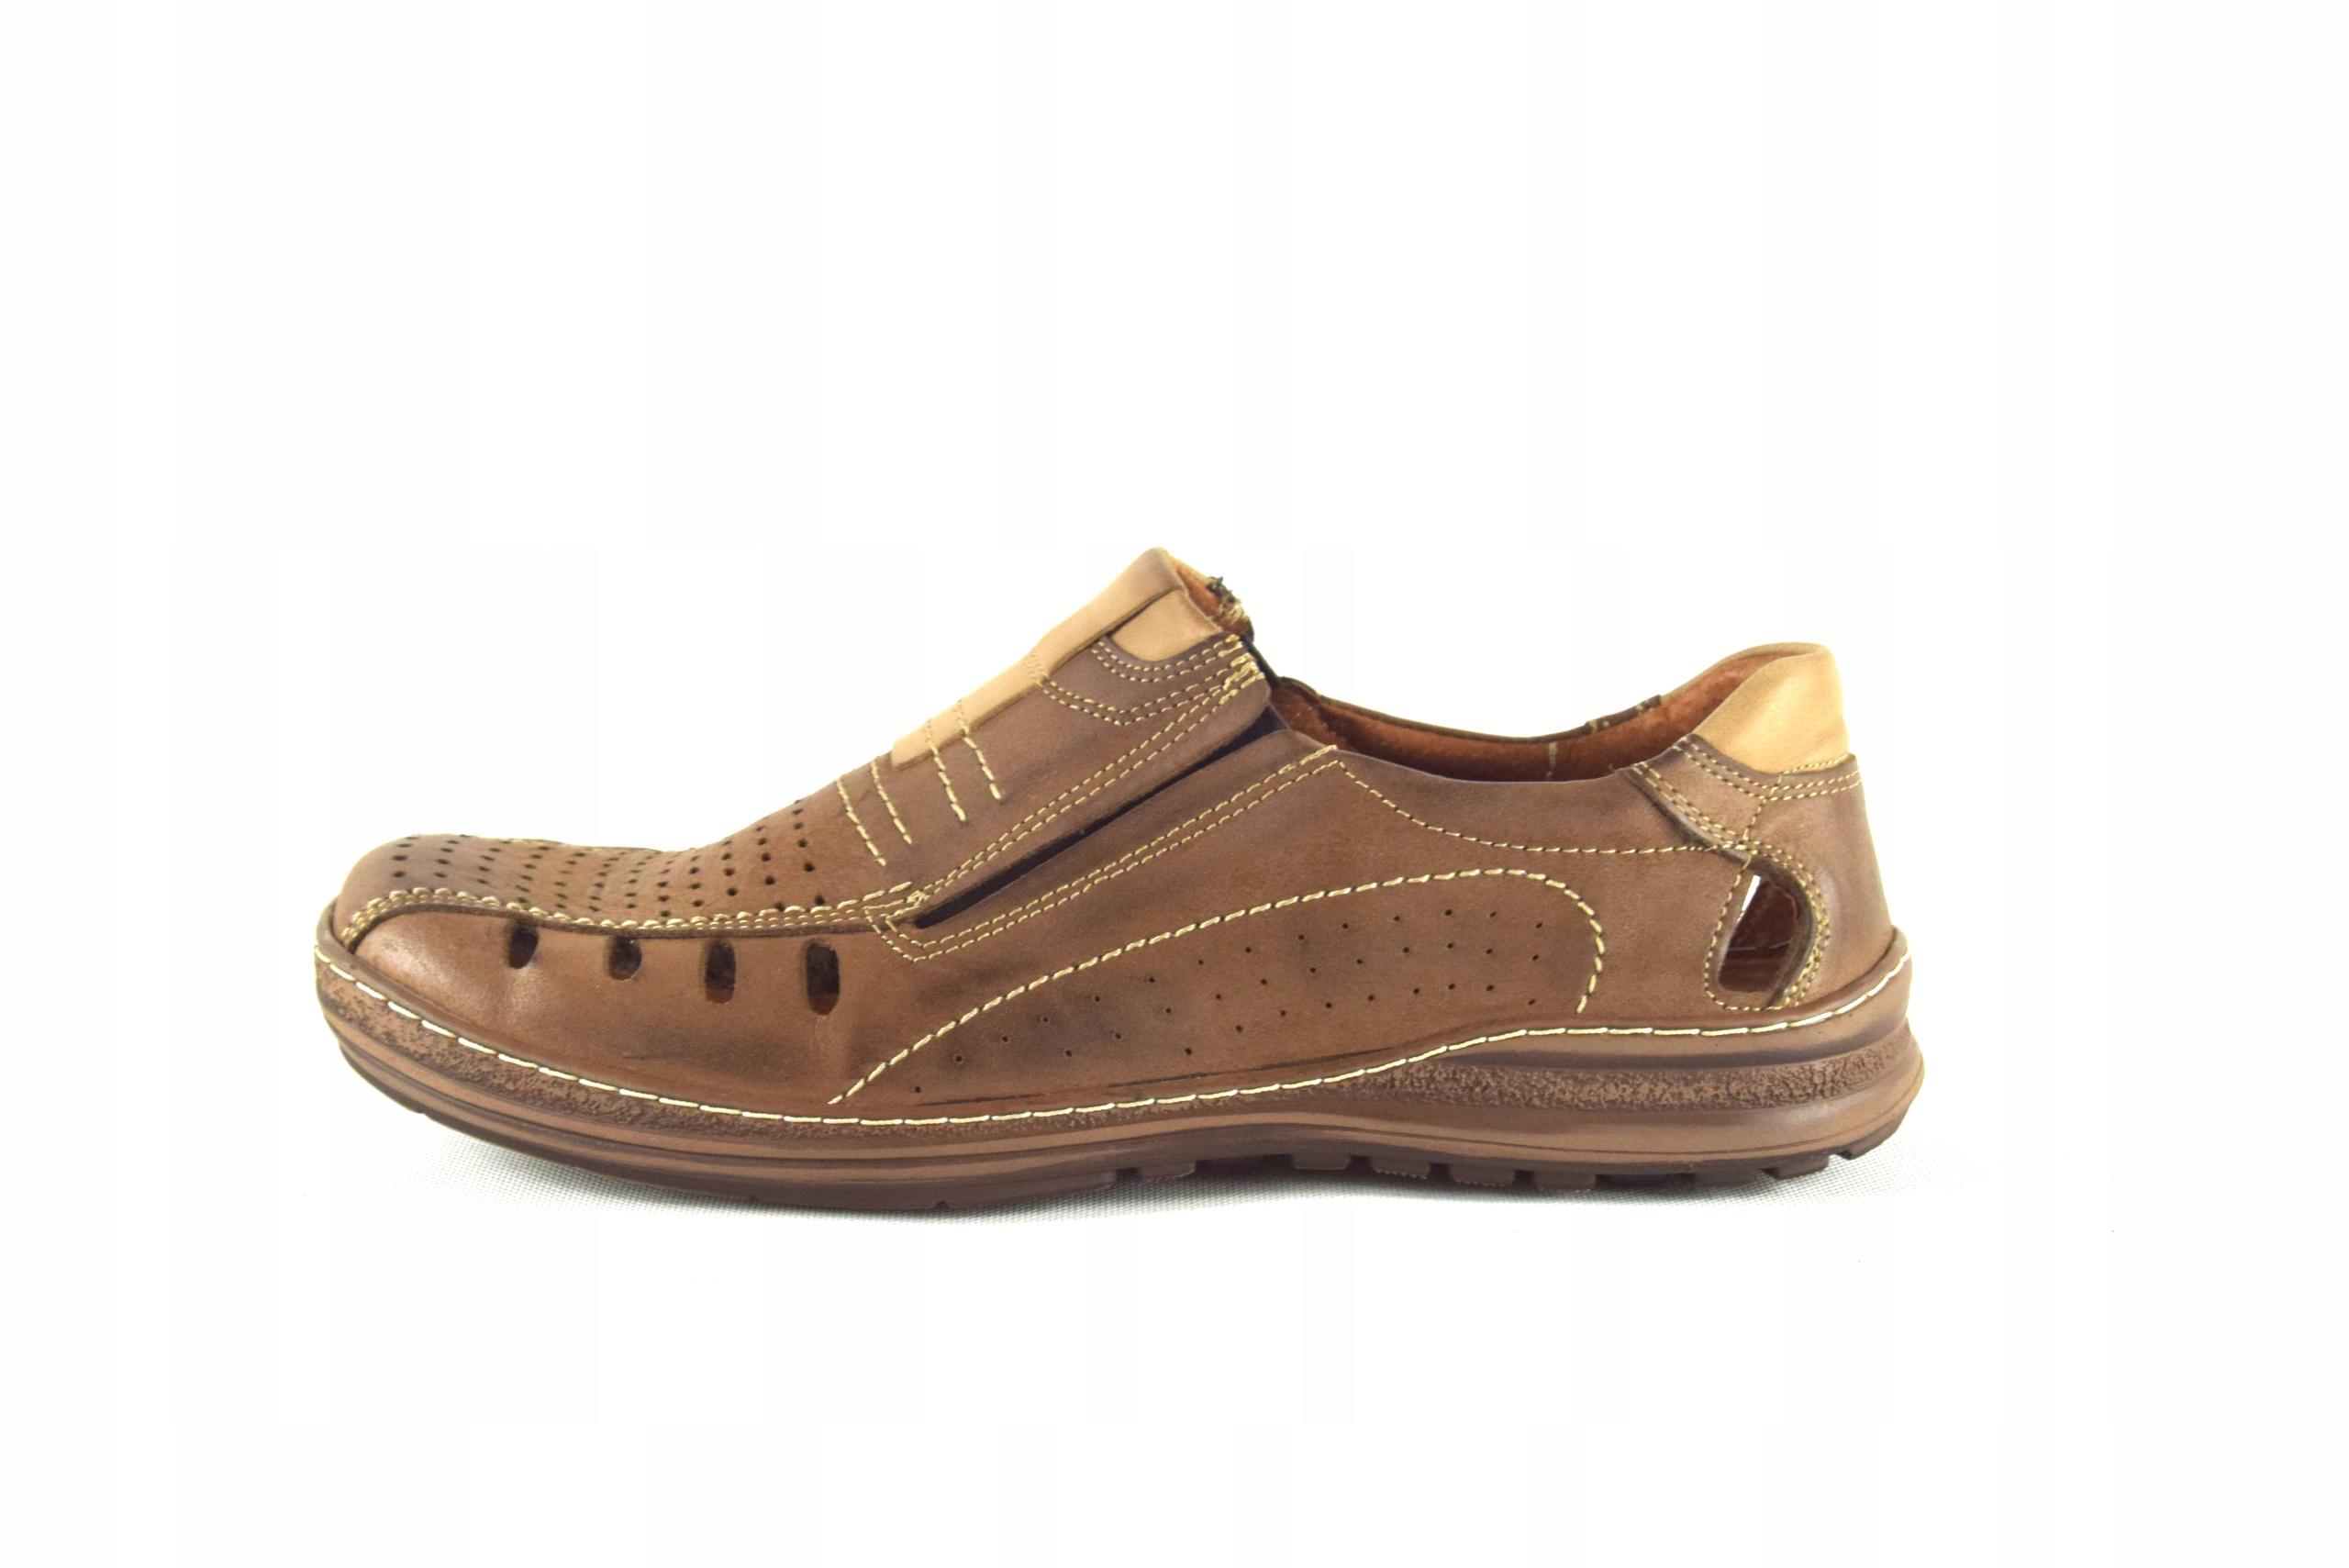 Mokasyny na lato buty ze skóry męskie dziurki 190L Marka inna